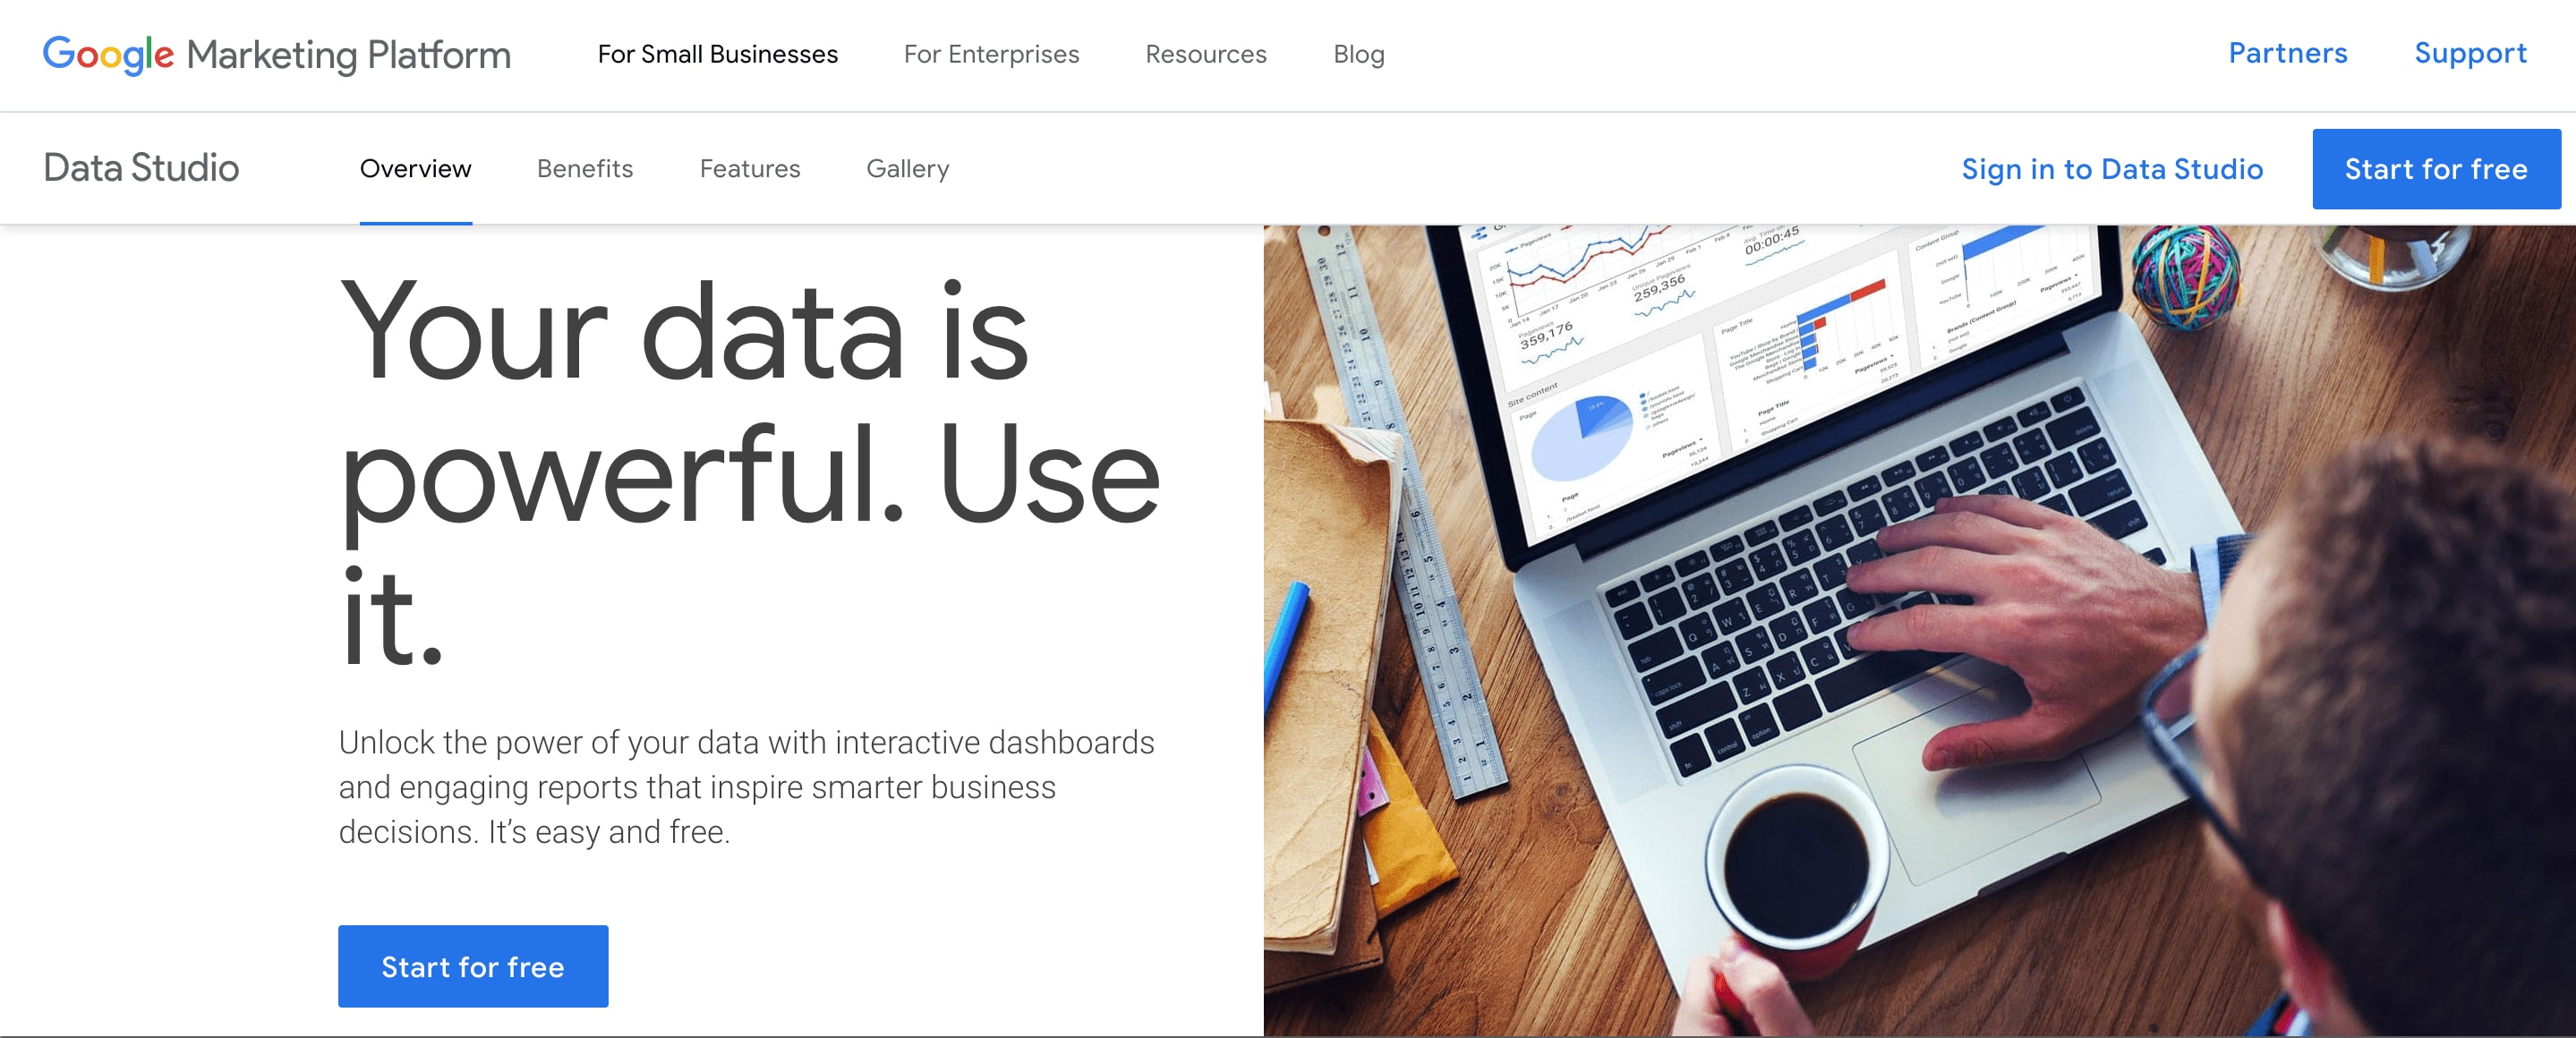 Google Data Studio Pricing